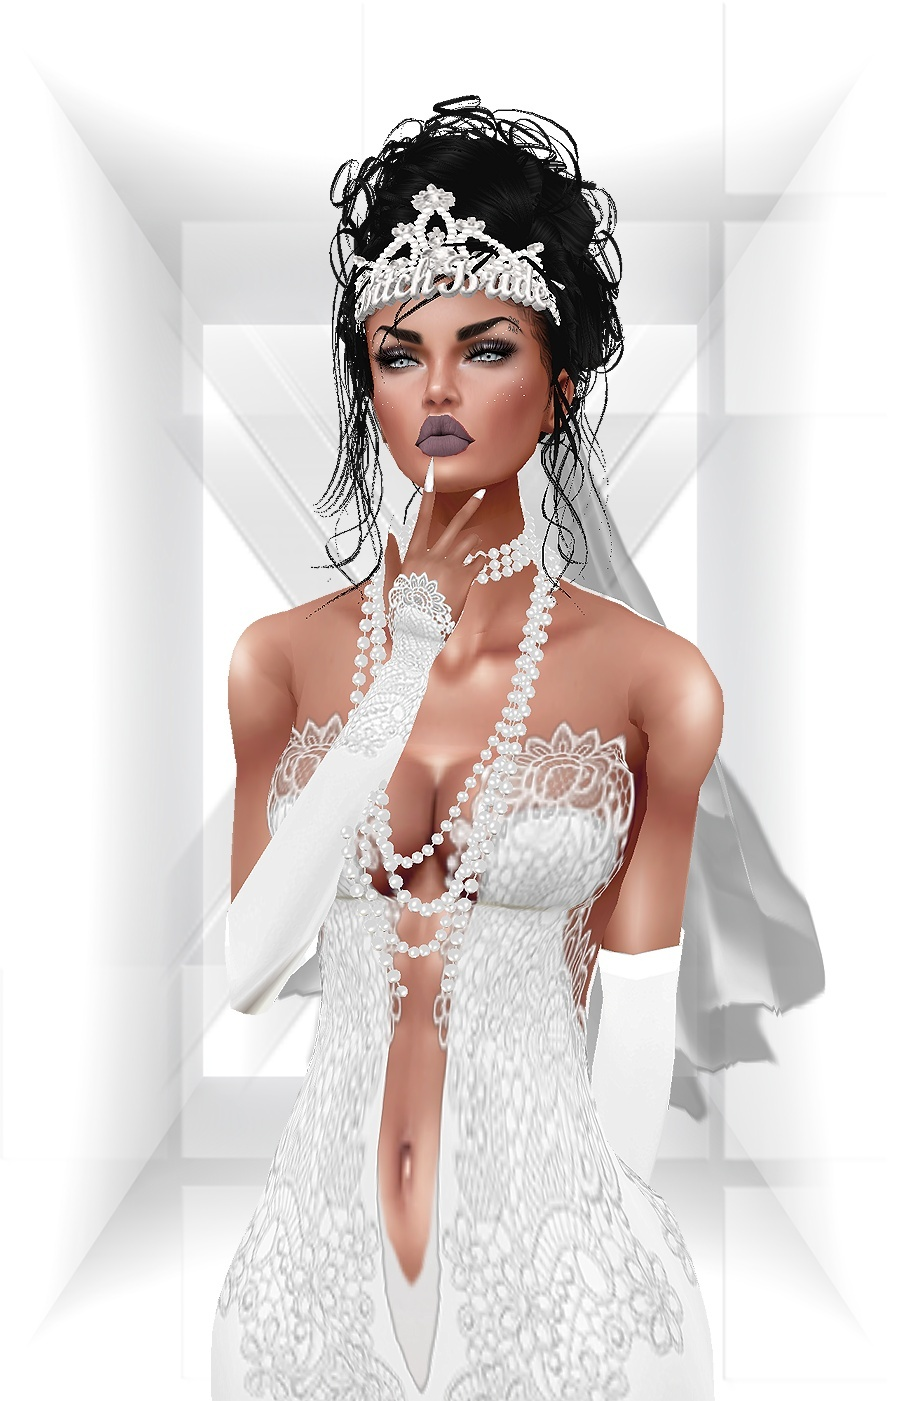 Bitch Bride